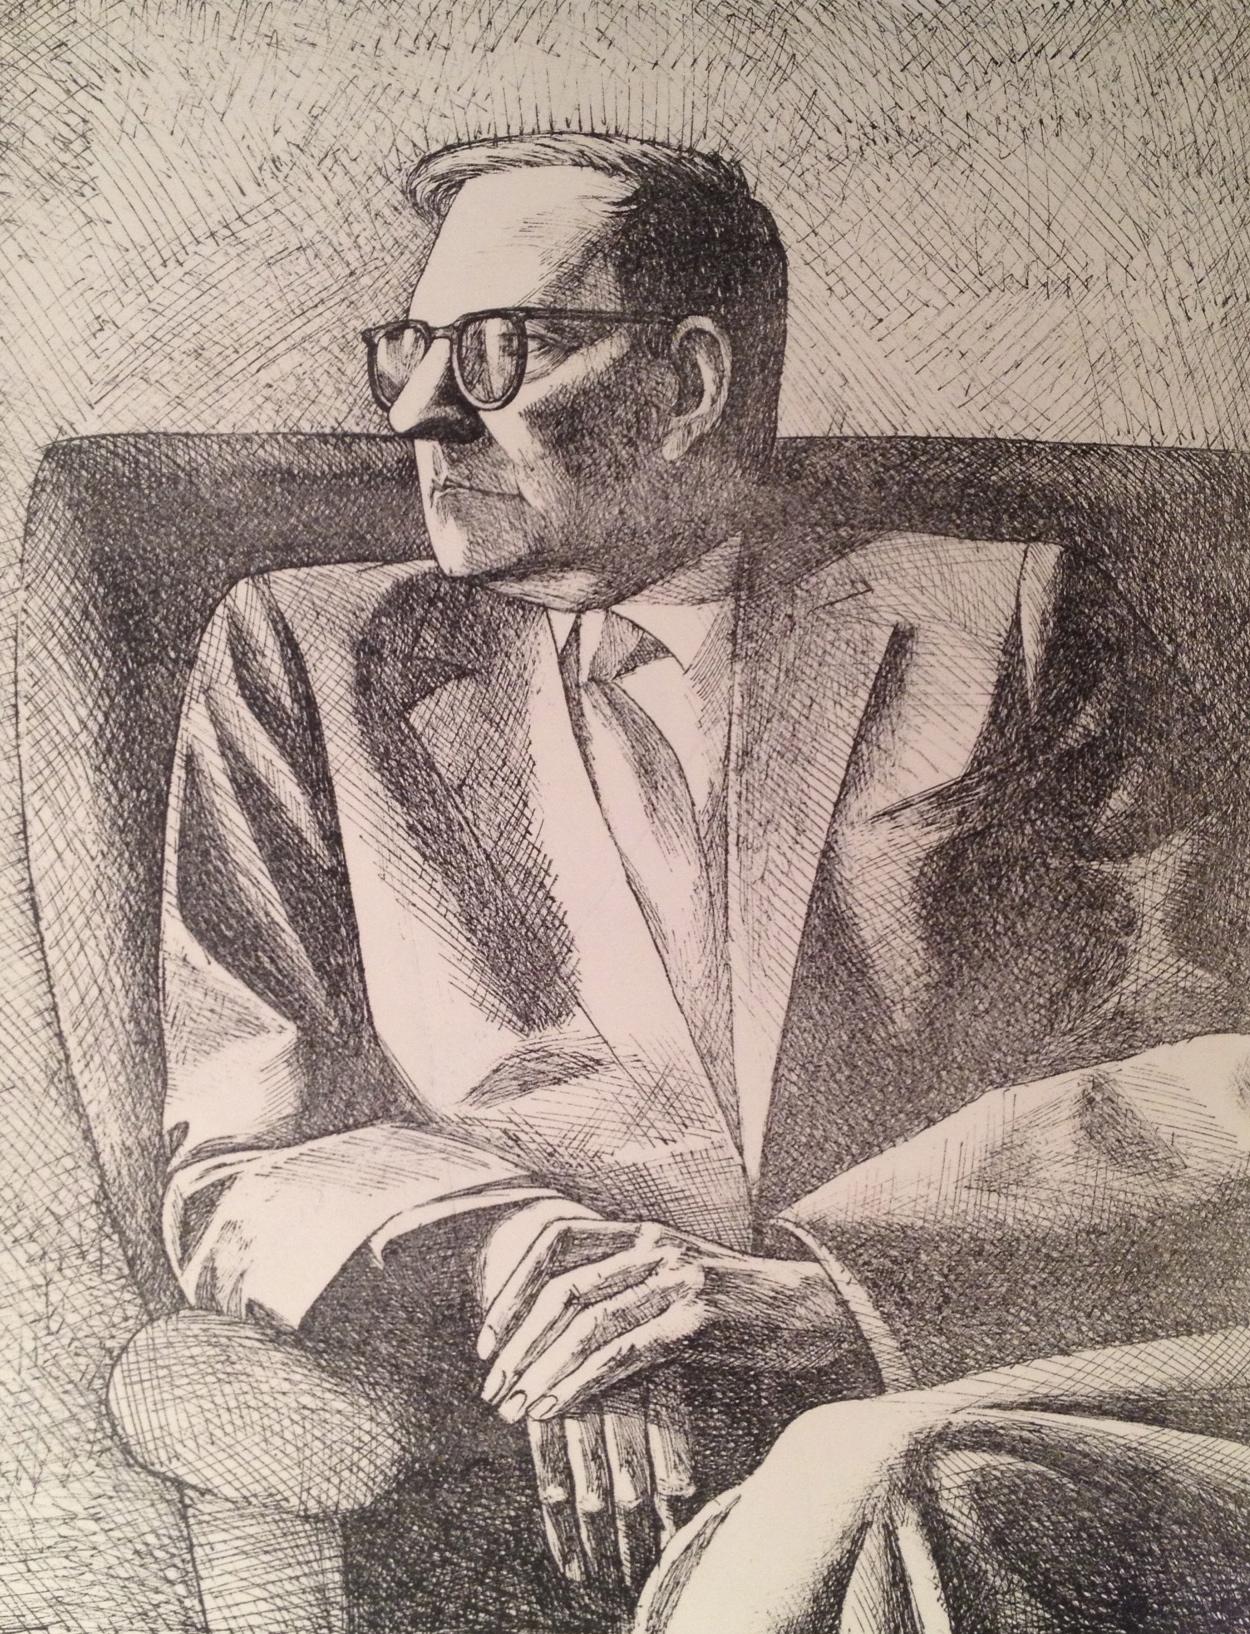 Бачурин Евгений Владимирович. Портрет композитора Дмитрия Шостаковича.